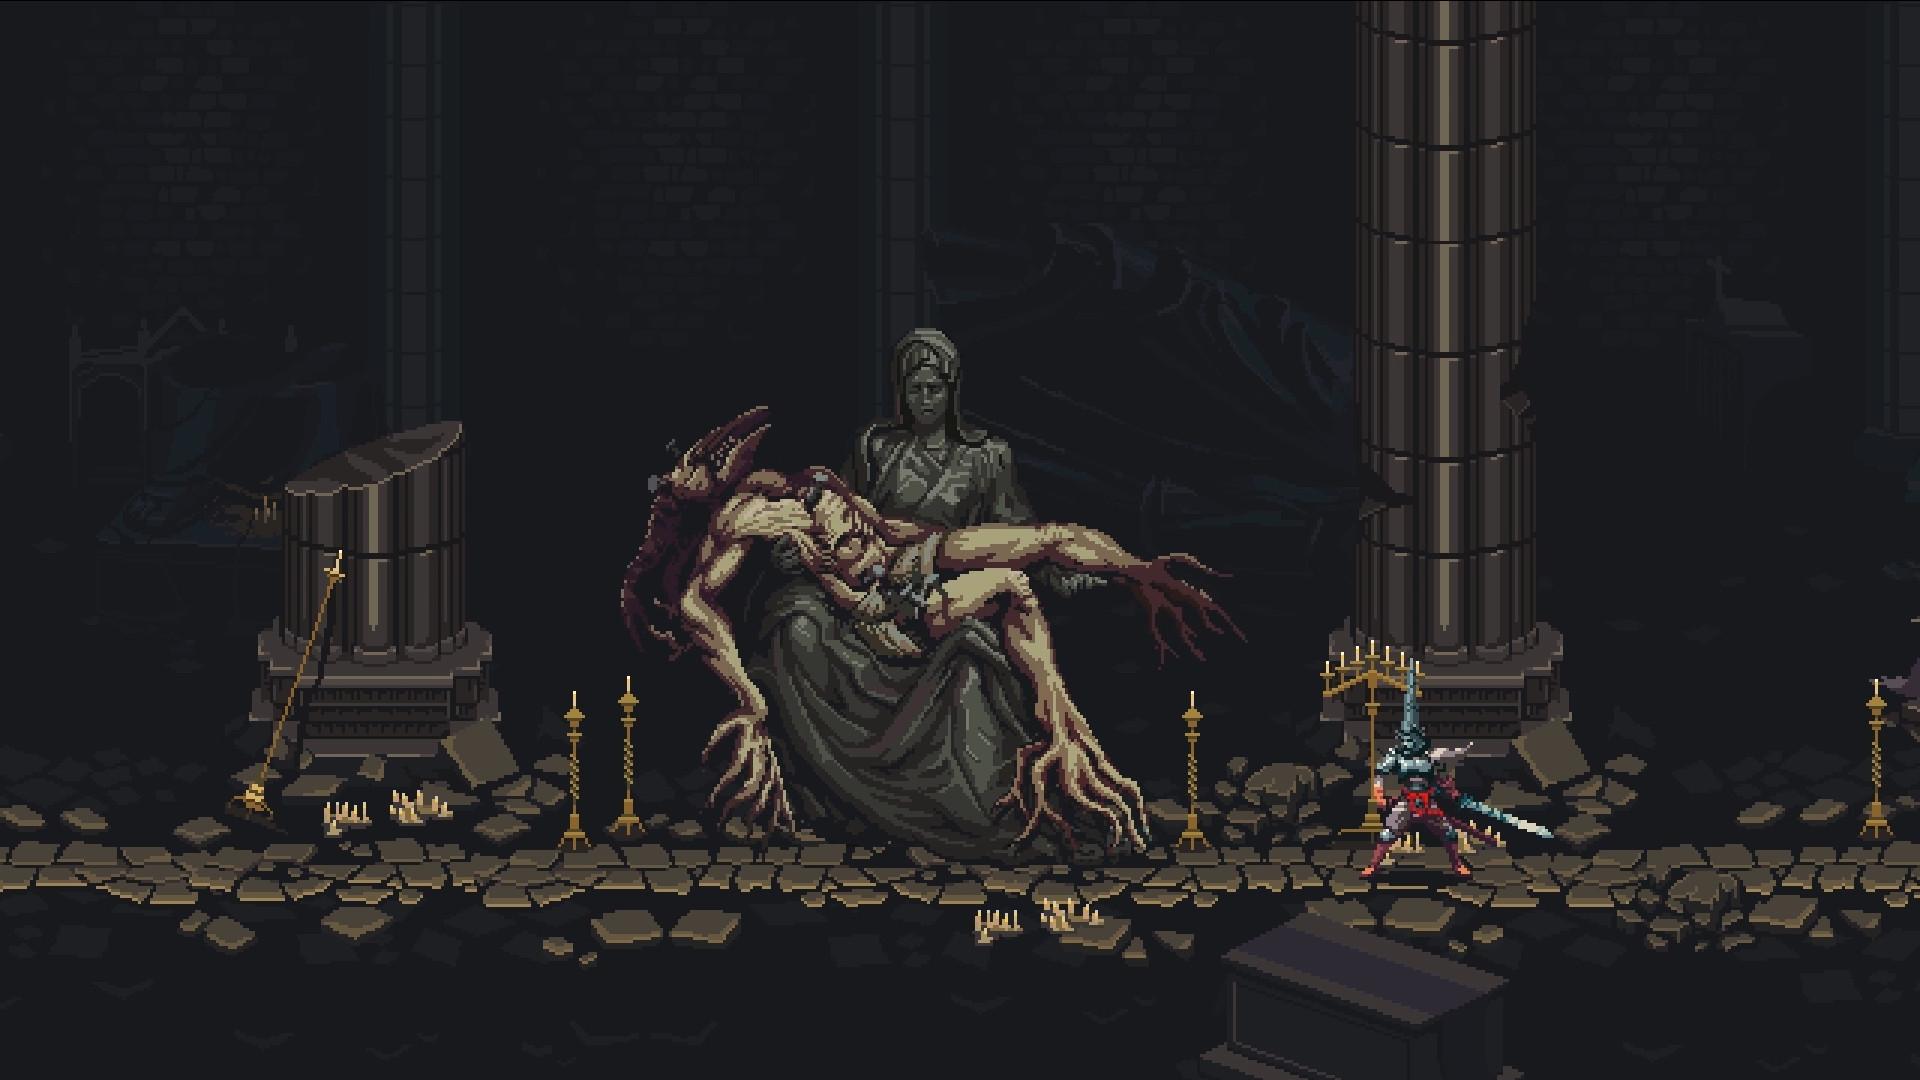 Blasphemous: Strife and Ruin